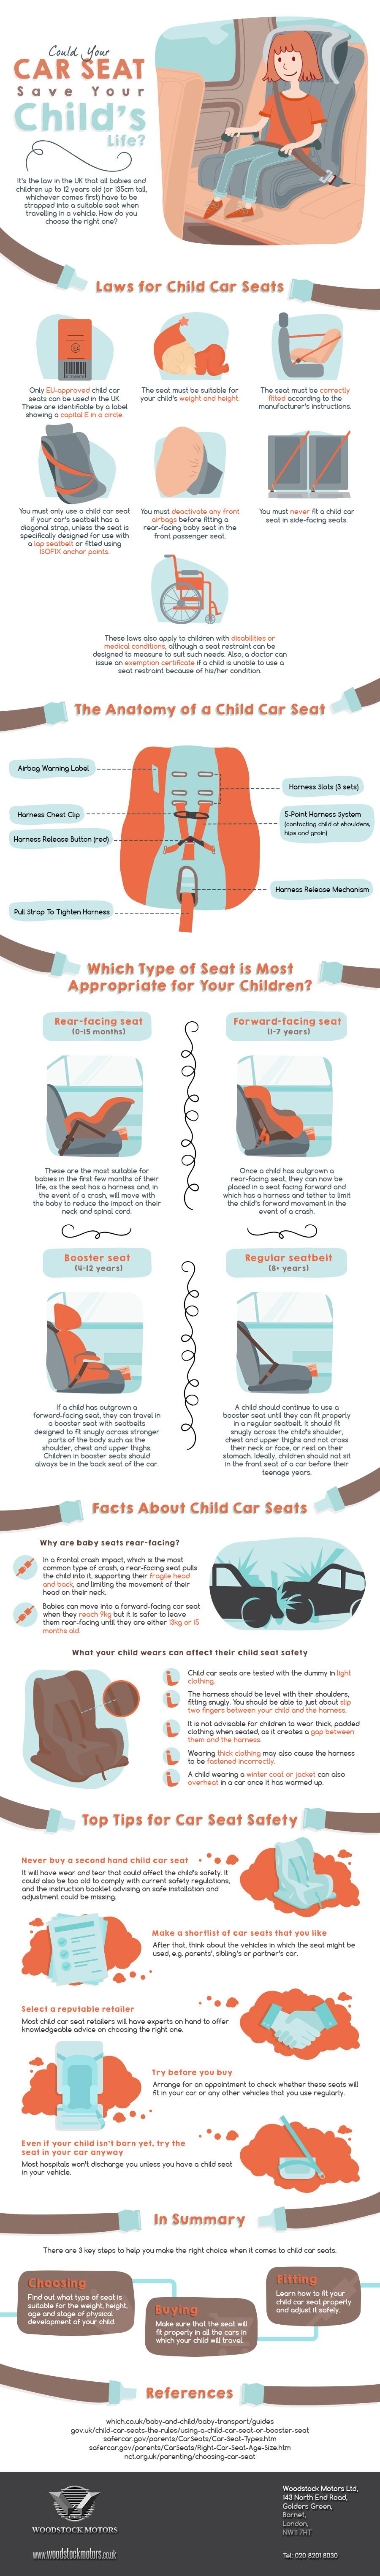 child car seats infographic